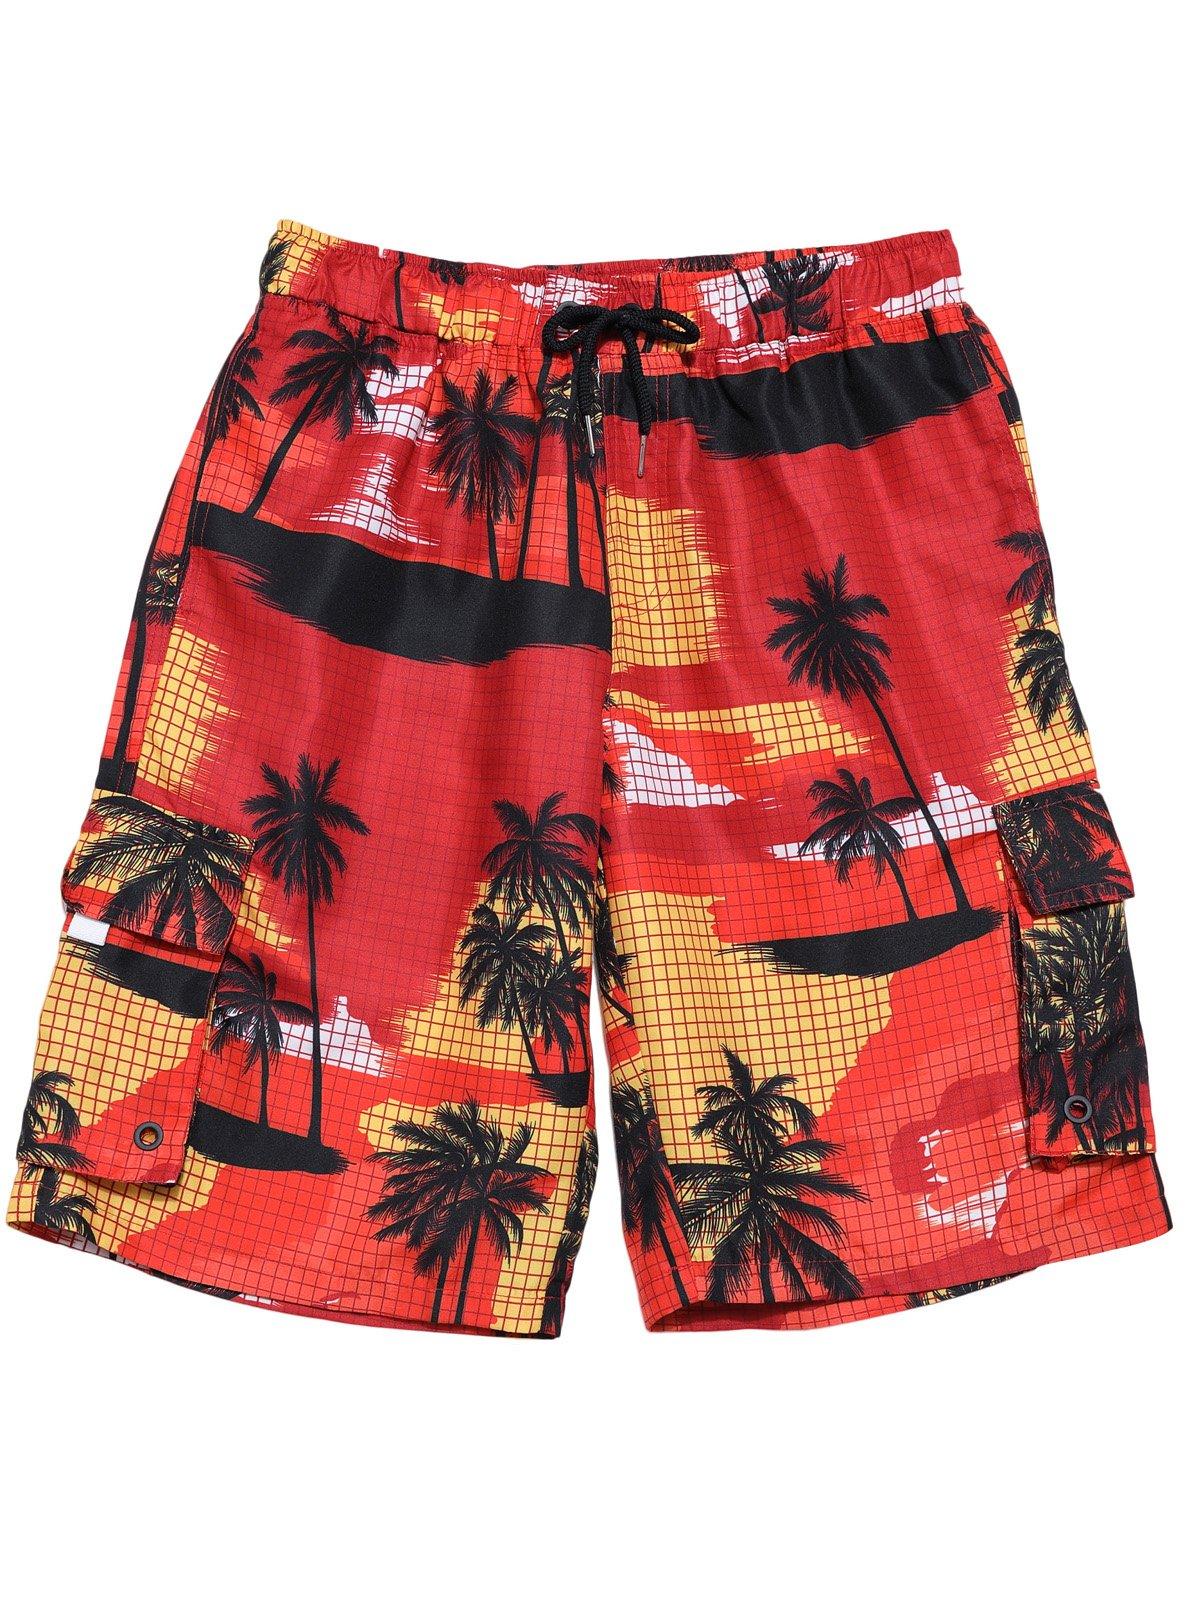 Hopioneer Men's Tropical Printed Shorts Beach Wear Surfing Swim Trunks - XL